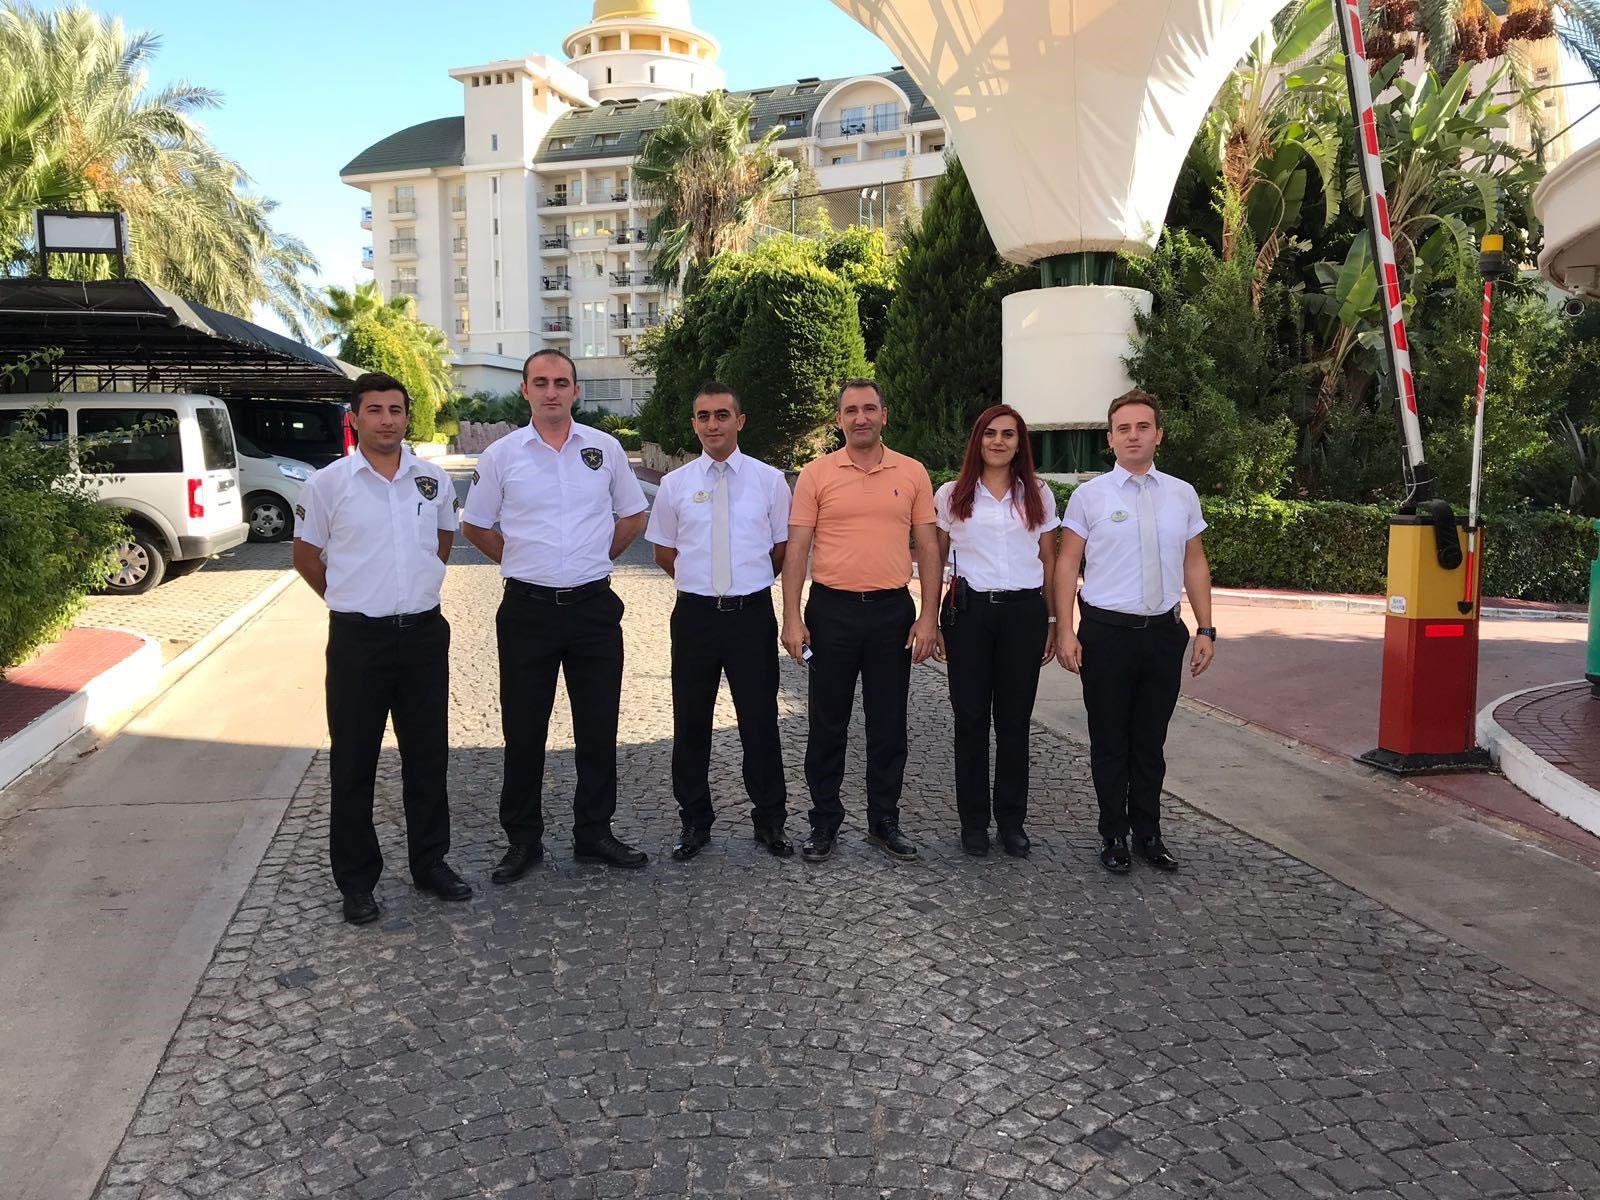 DELPHİN DİVA PREMİERE HOTEL GÜVENLİK DEPARTMANI